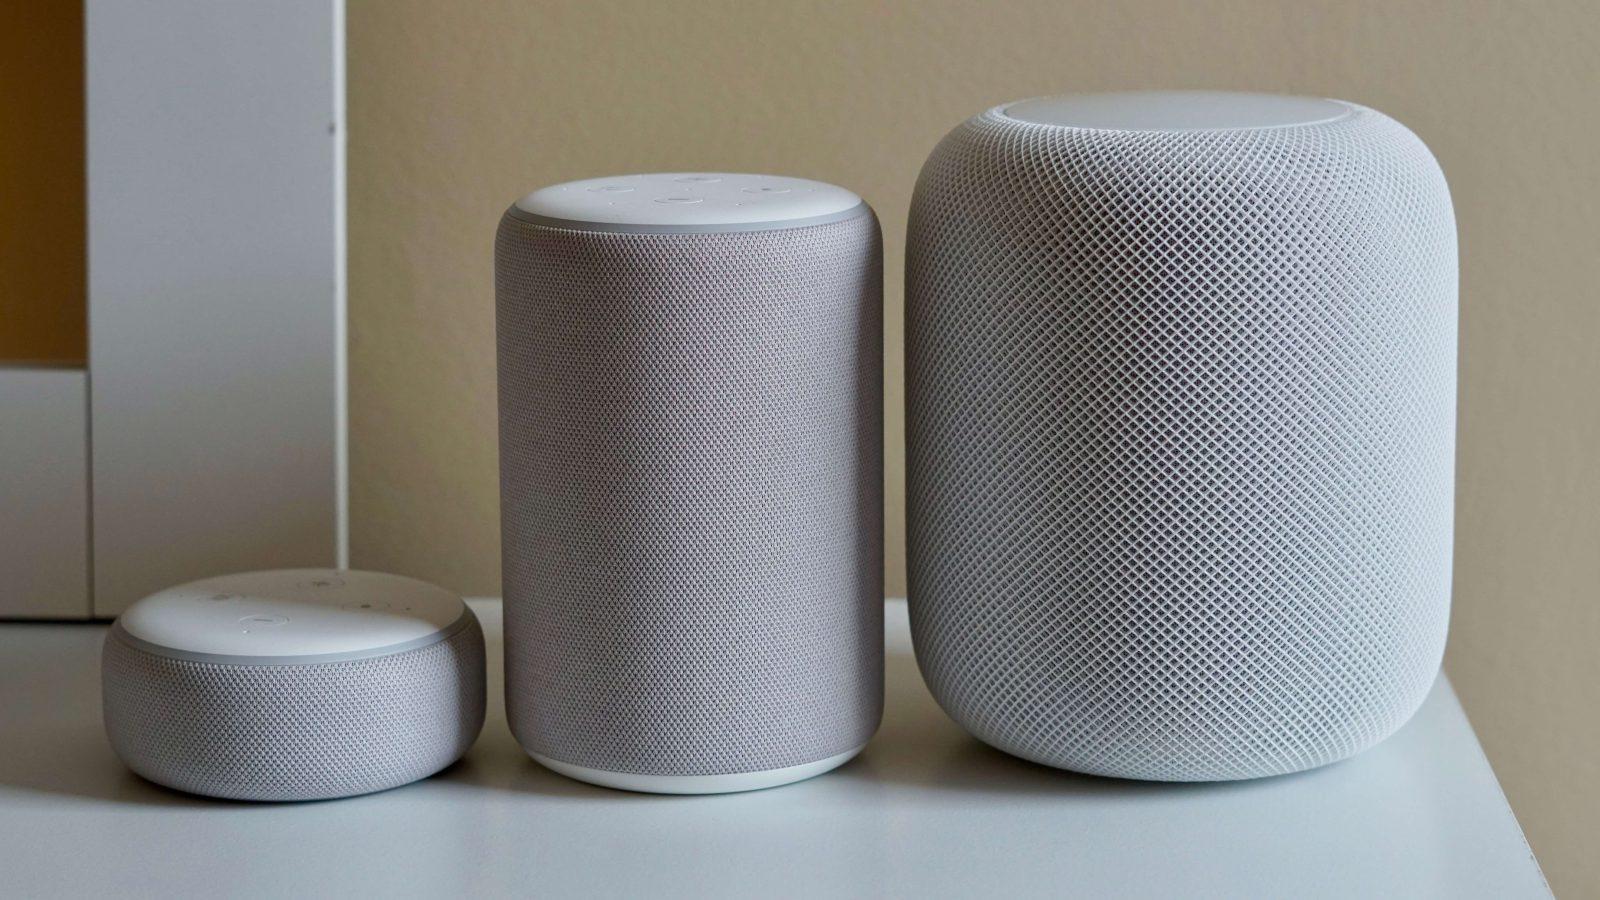 Amazon Music vs Apple Music: Amazon now growing faster - 9to5Mac